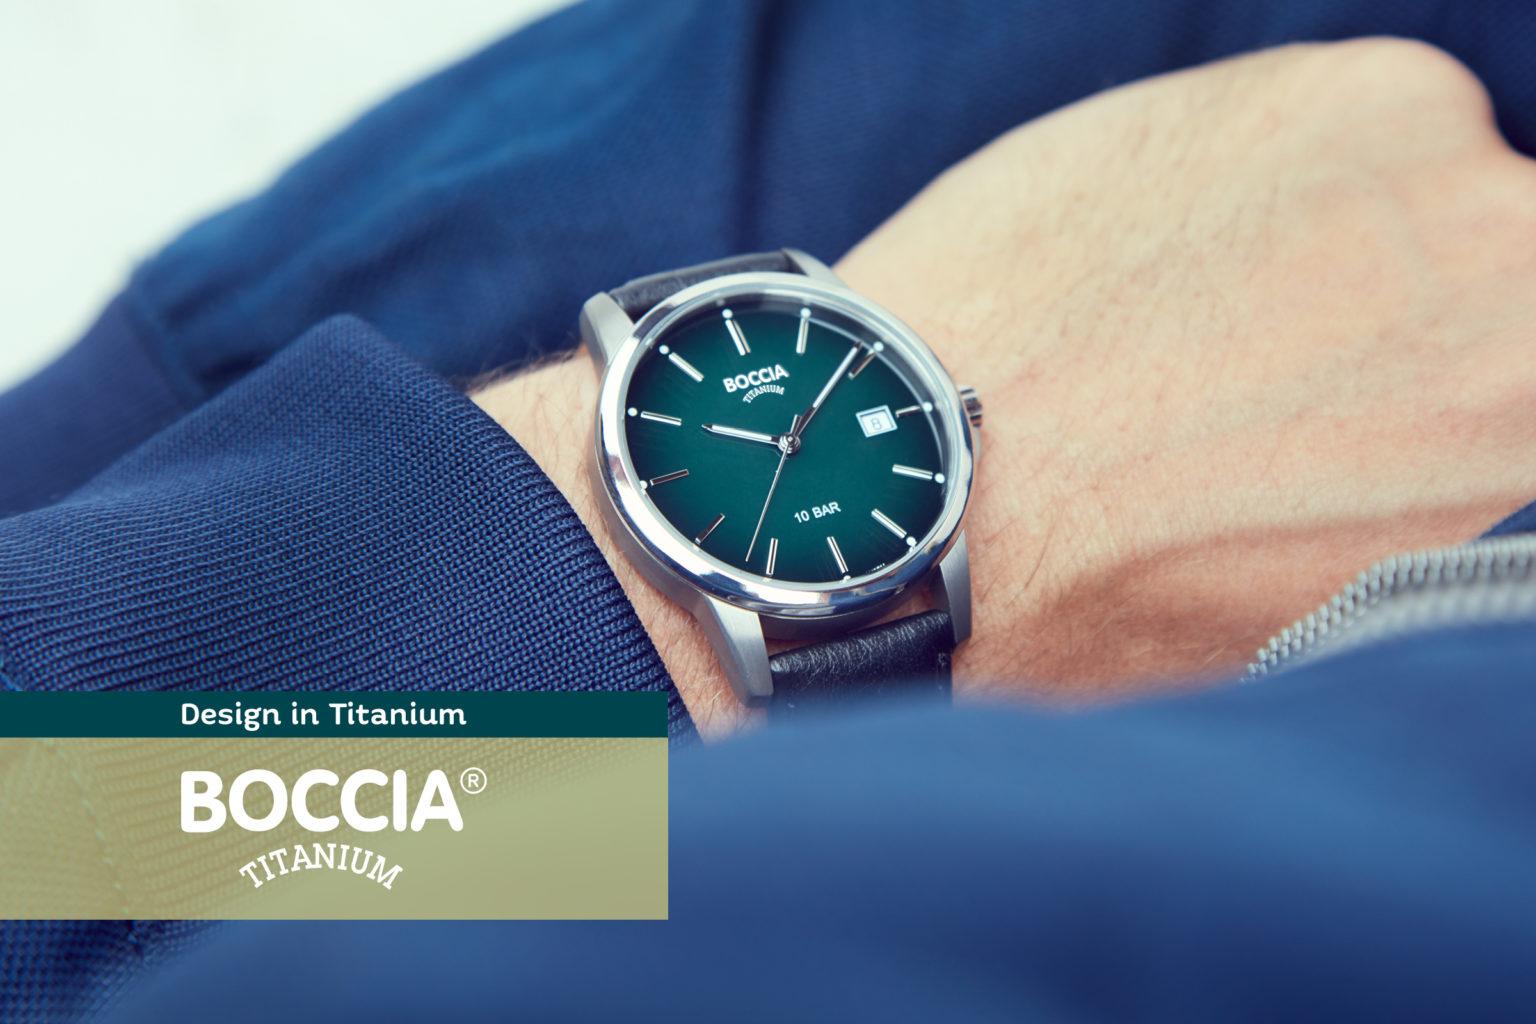 Boccia_Banner_Modell 3633-02____ 2400 x 1600 px